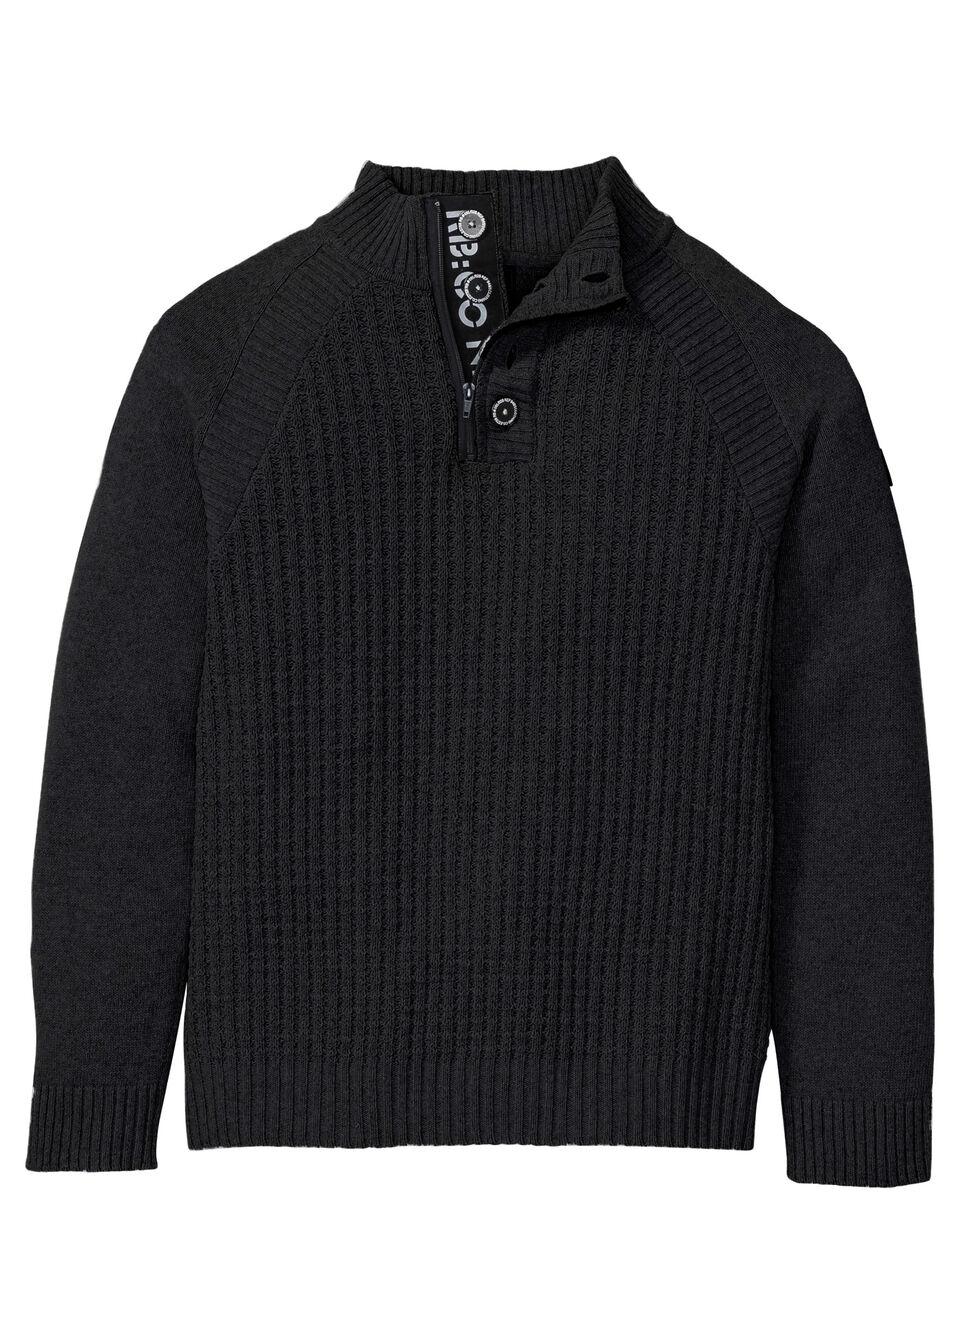 Фото - Пуловер от bonprix черного цвета